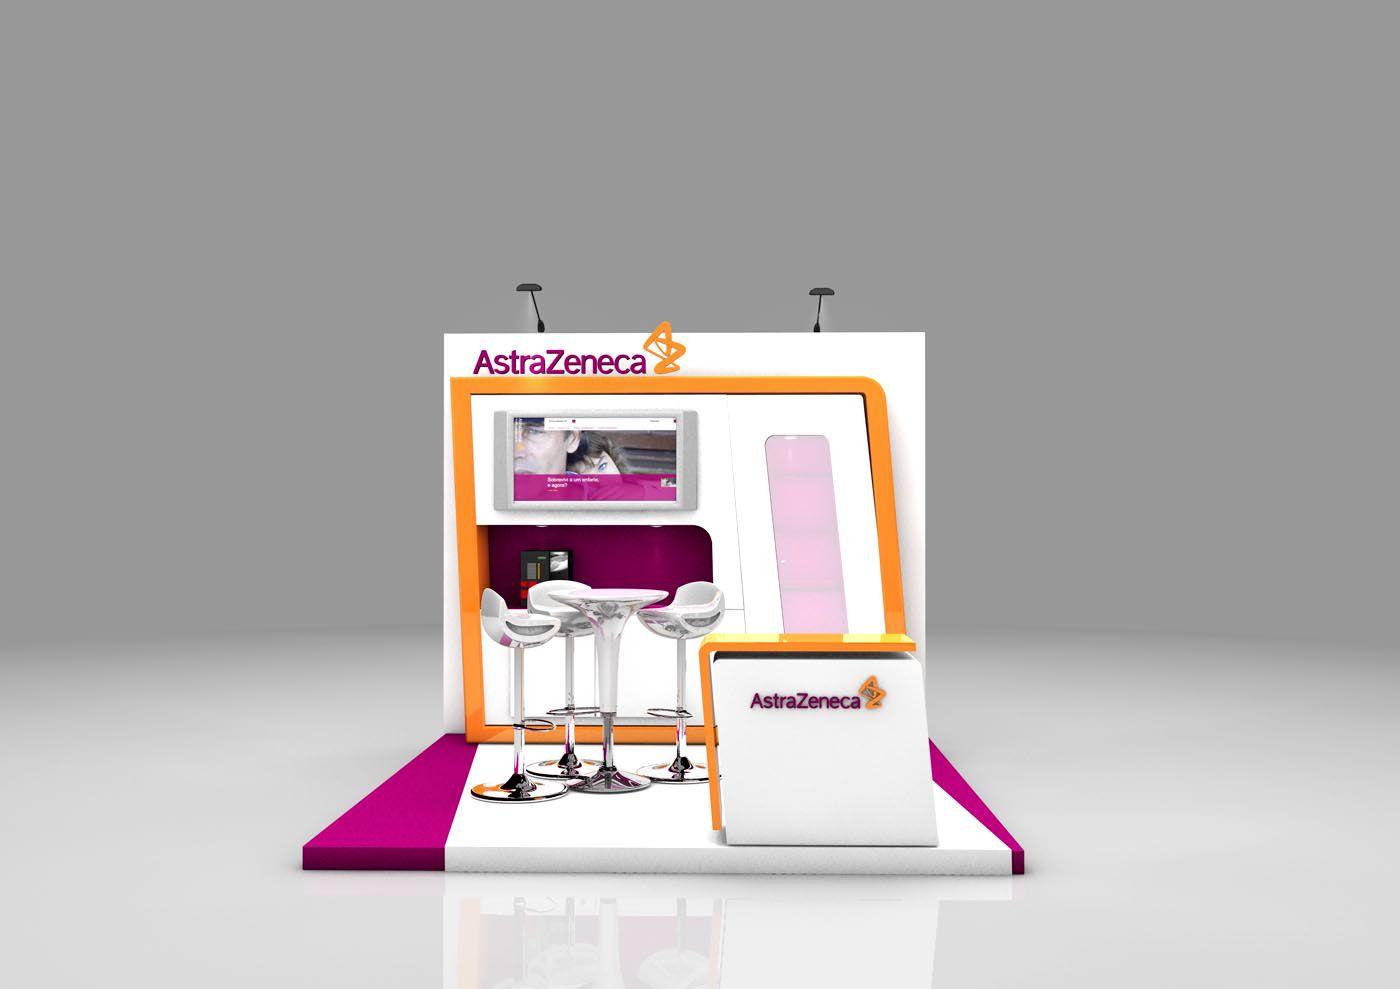 Exhibition Booth Design For Astrazeneca Con Imagenes